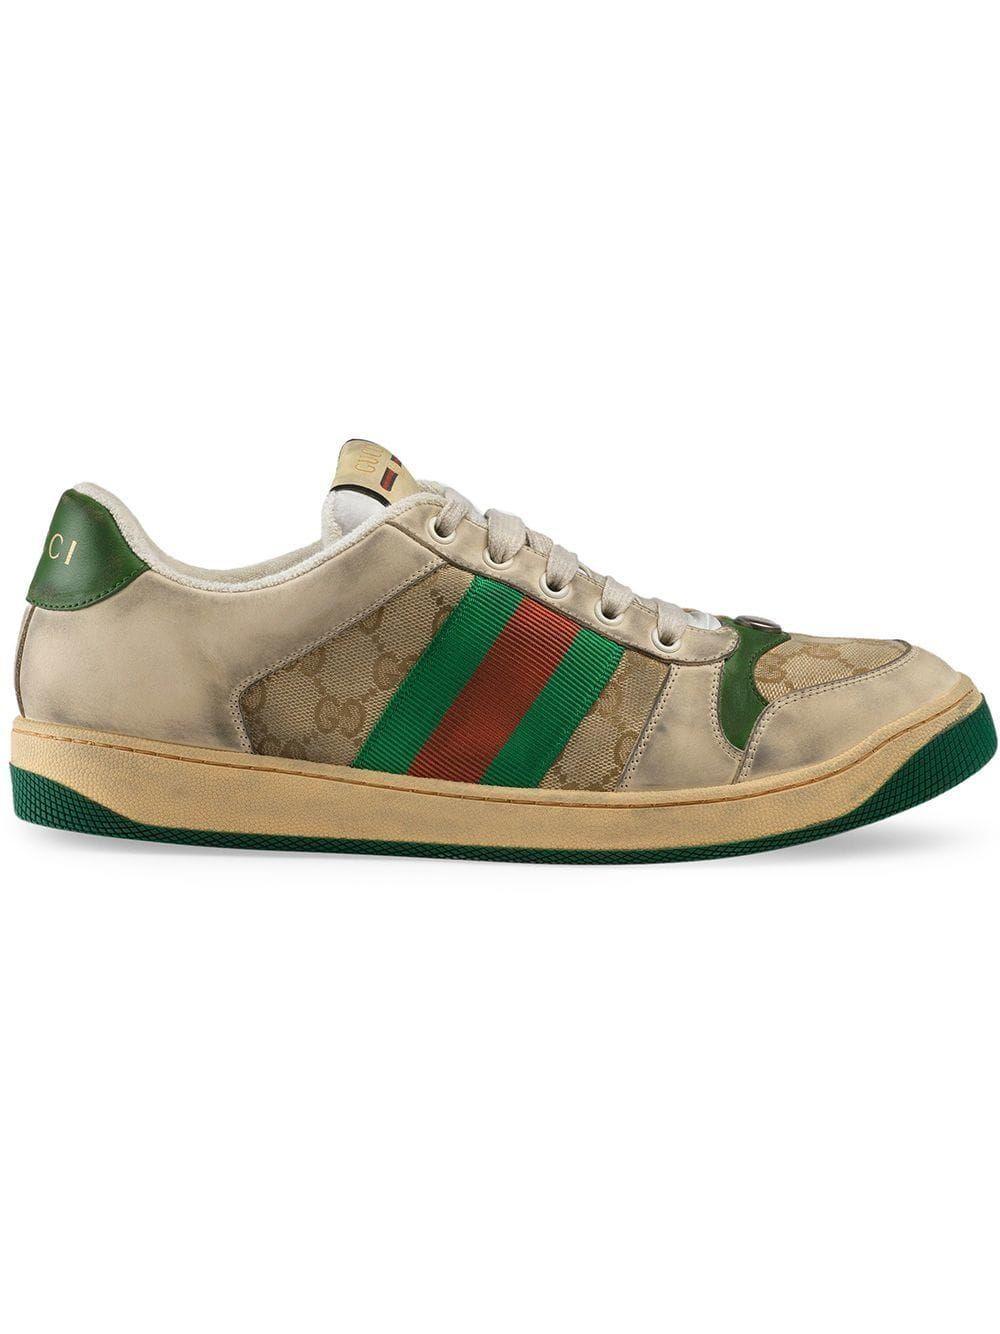 Gucci sneakers, Sneakers